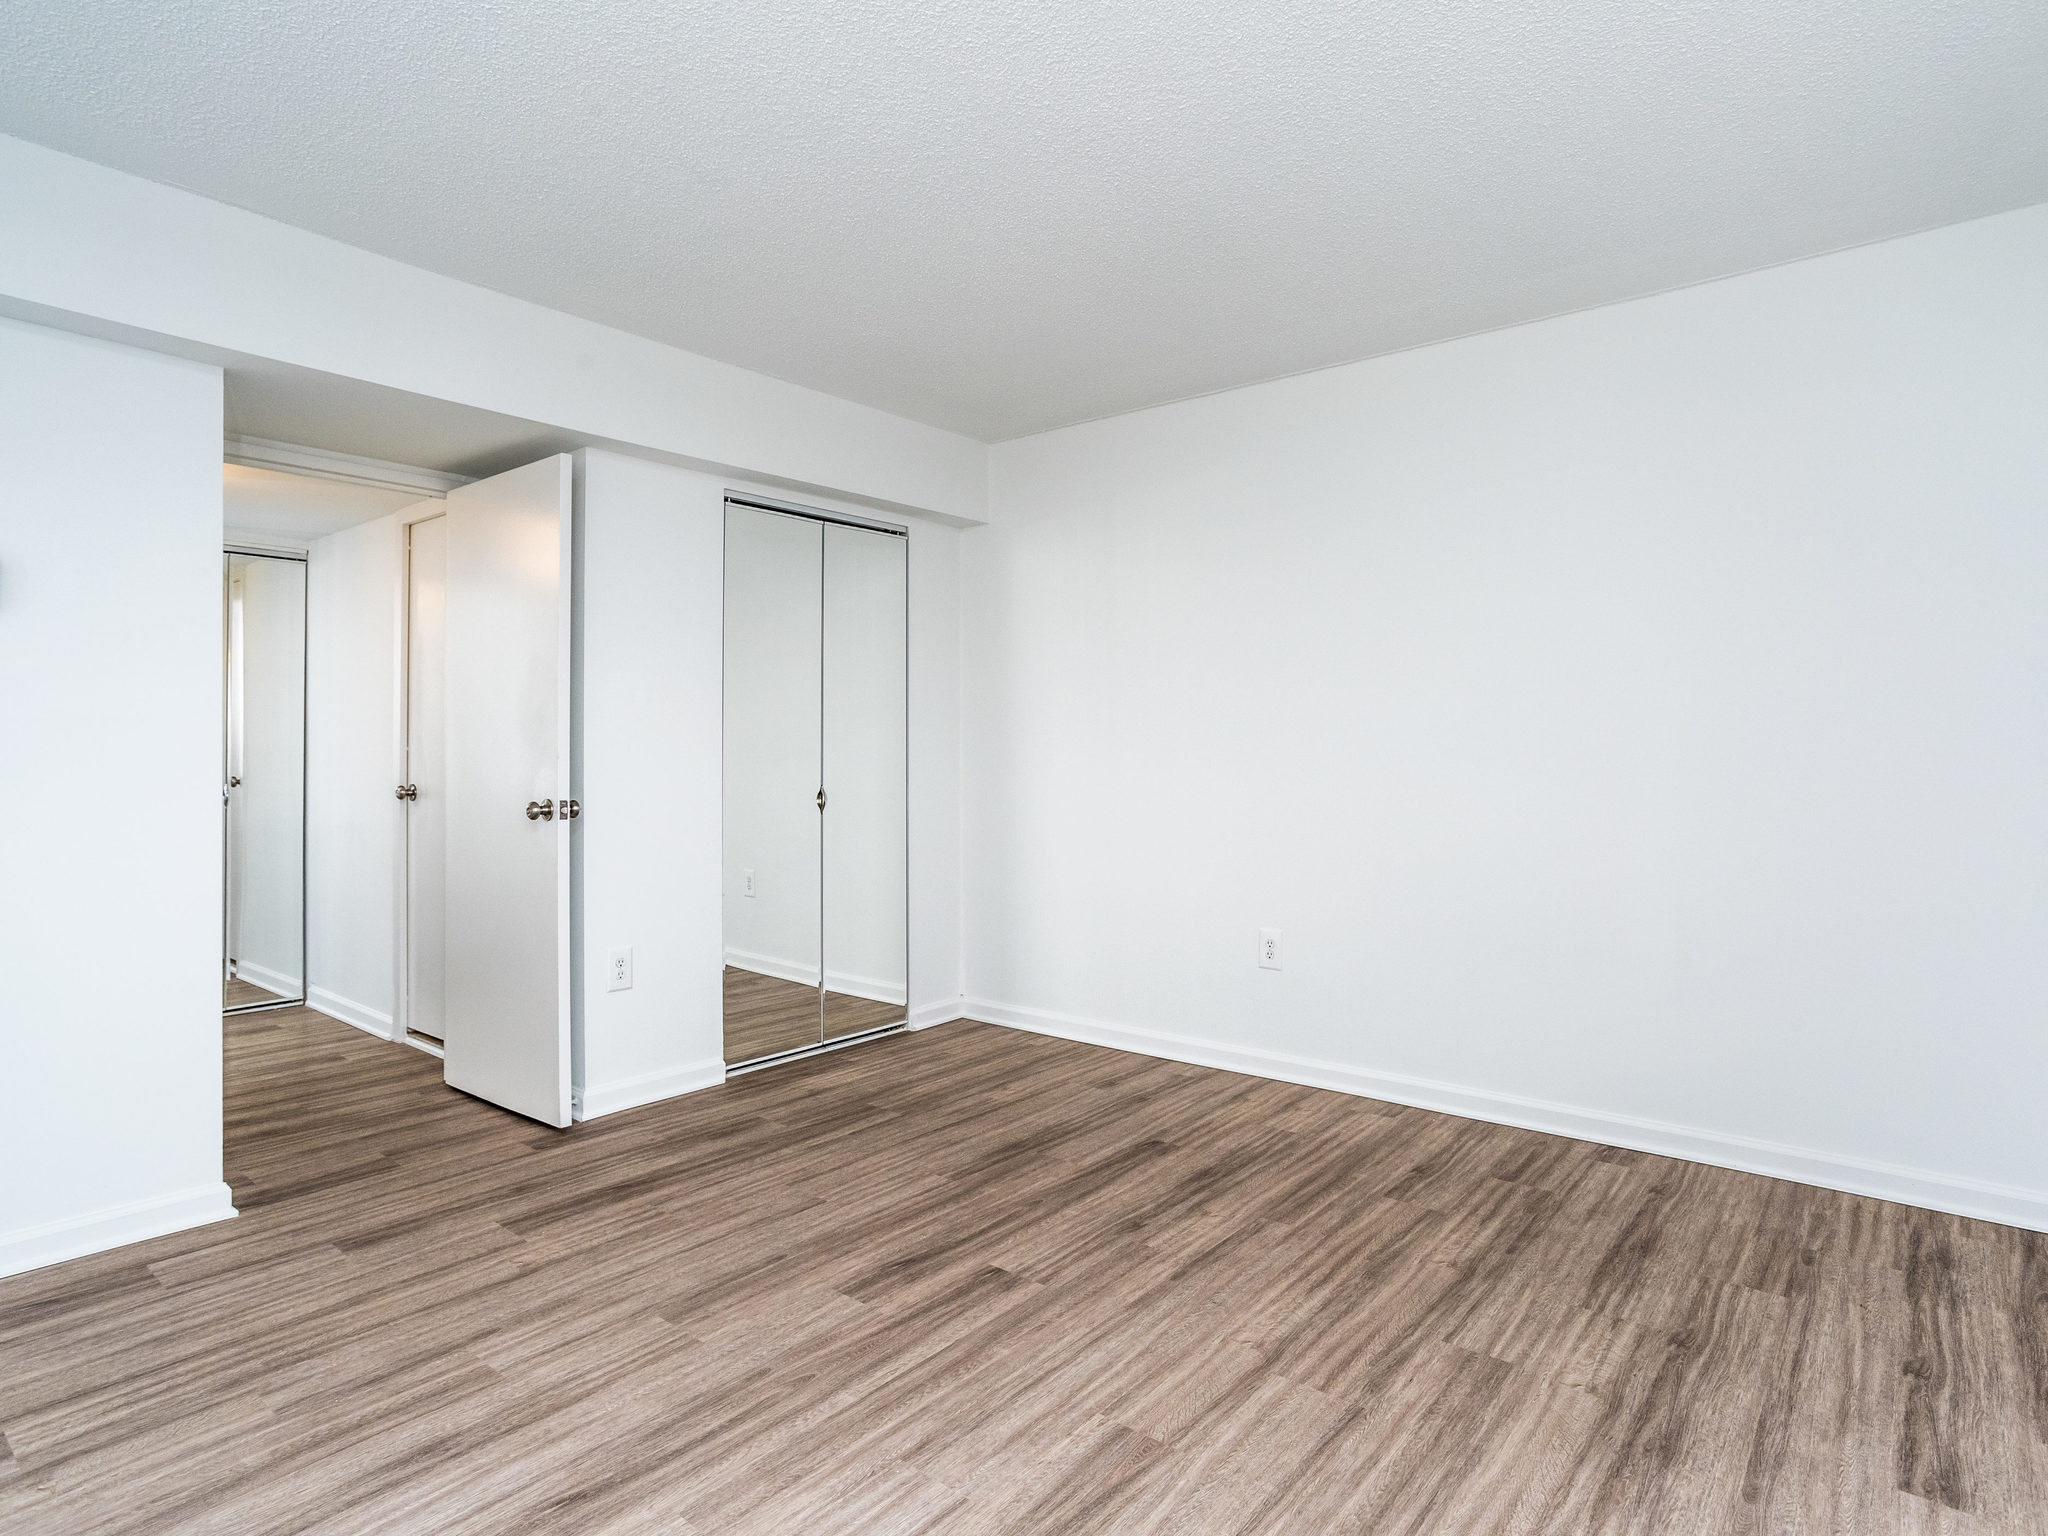 101 S Whiting St 1505-MLS_Size-014-12-Bedroom-2048x1536-72dpi.jpg